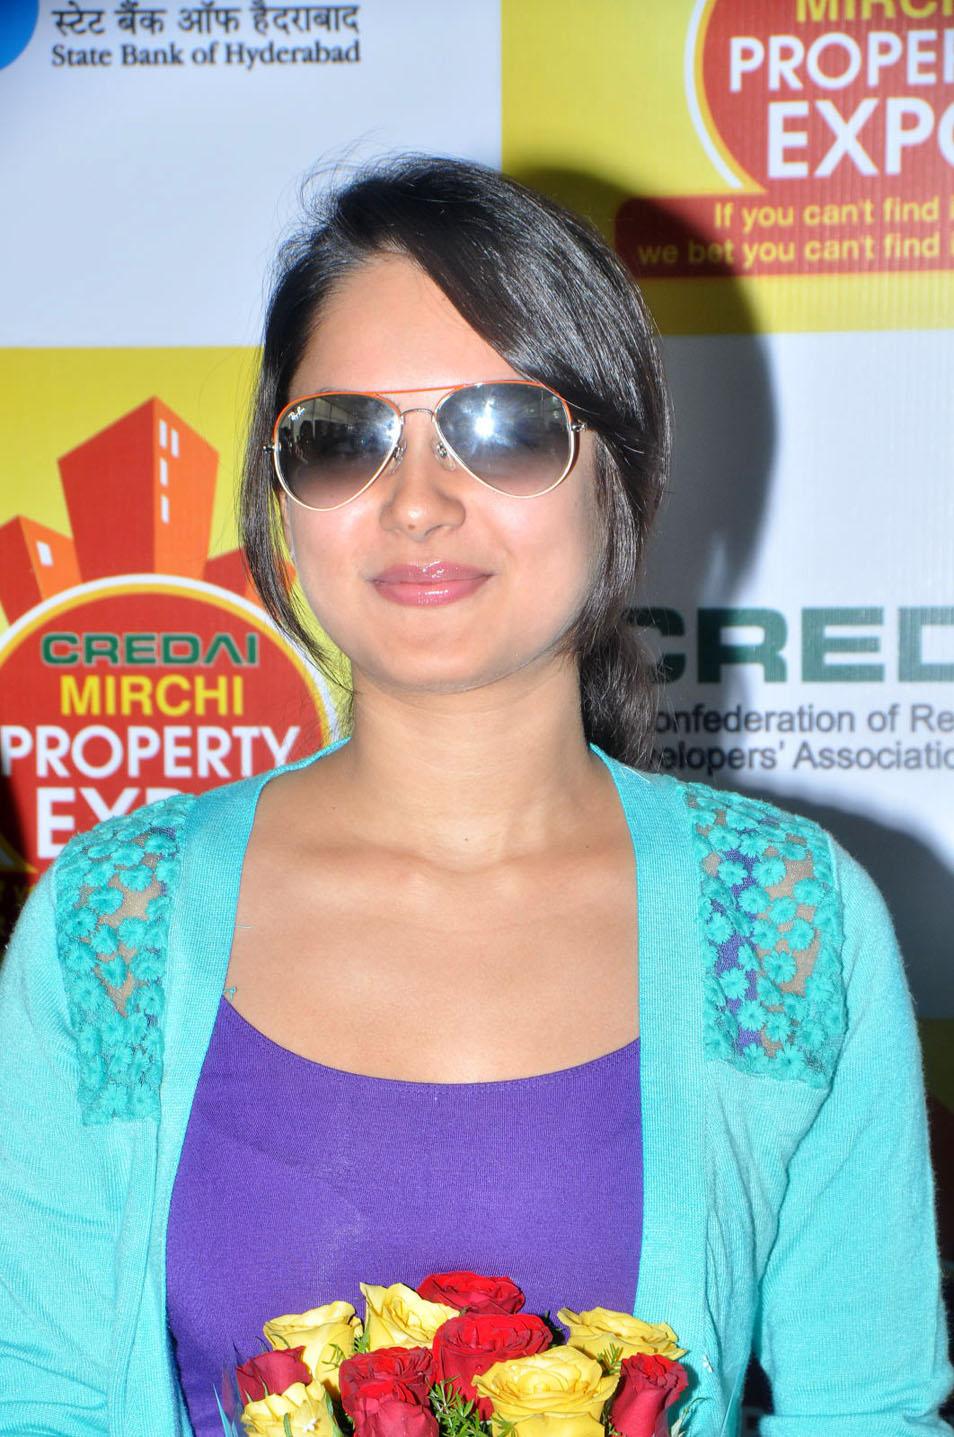 Pooja Bose In Jeans Pooja Bose stylish sti...